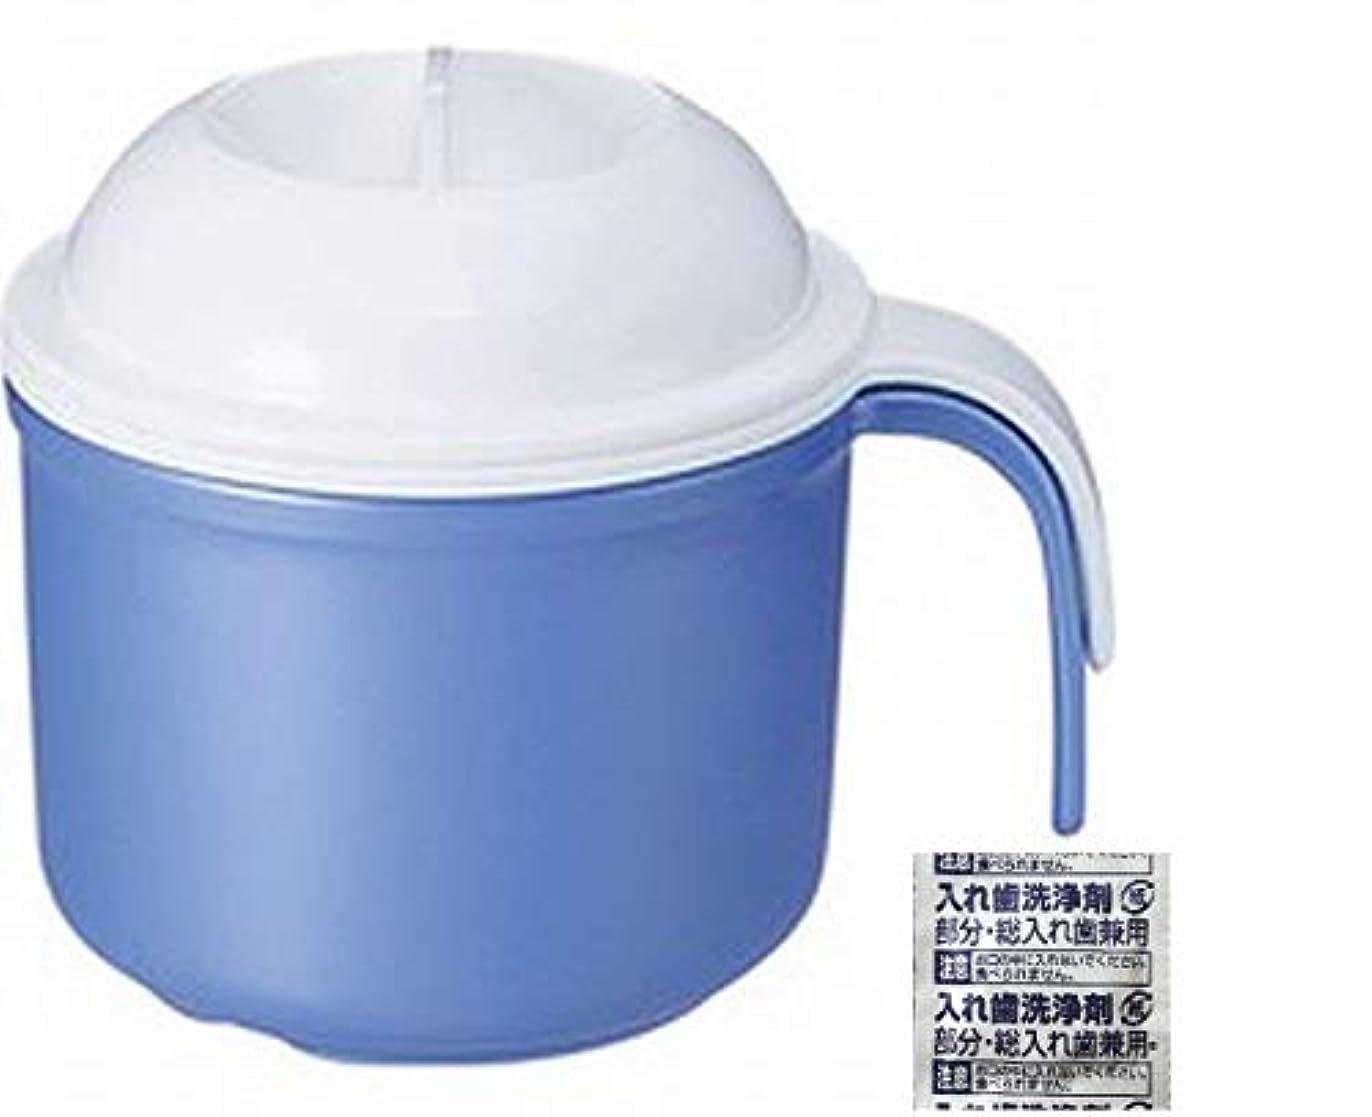 前者小道具ルーム日本製 入れ歯ケース 煮沸消毒可能 耐熱100度 J-9608